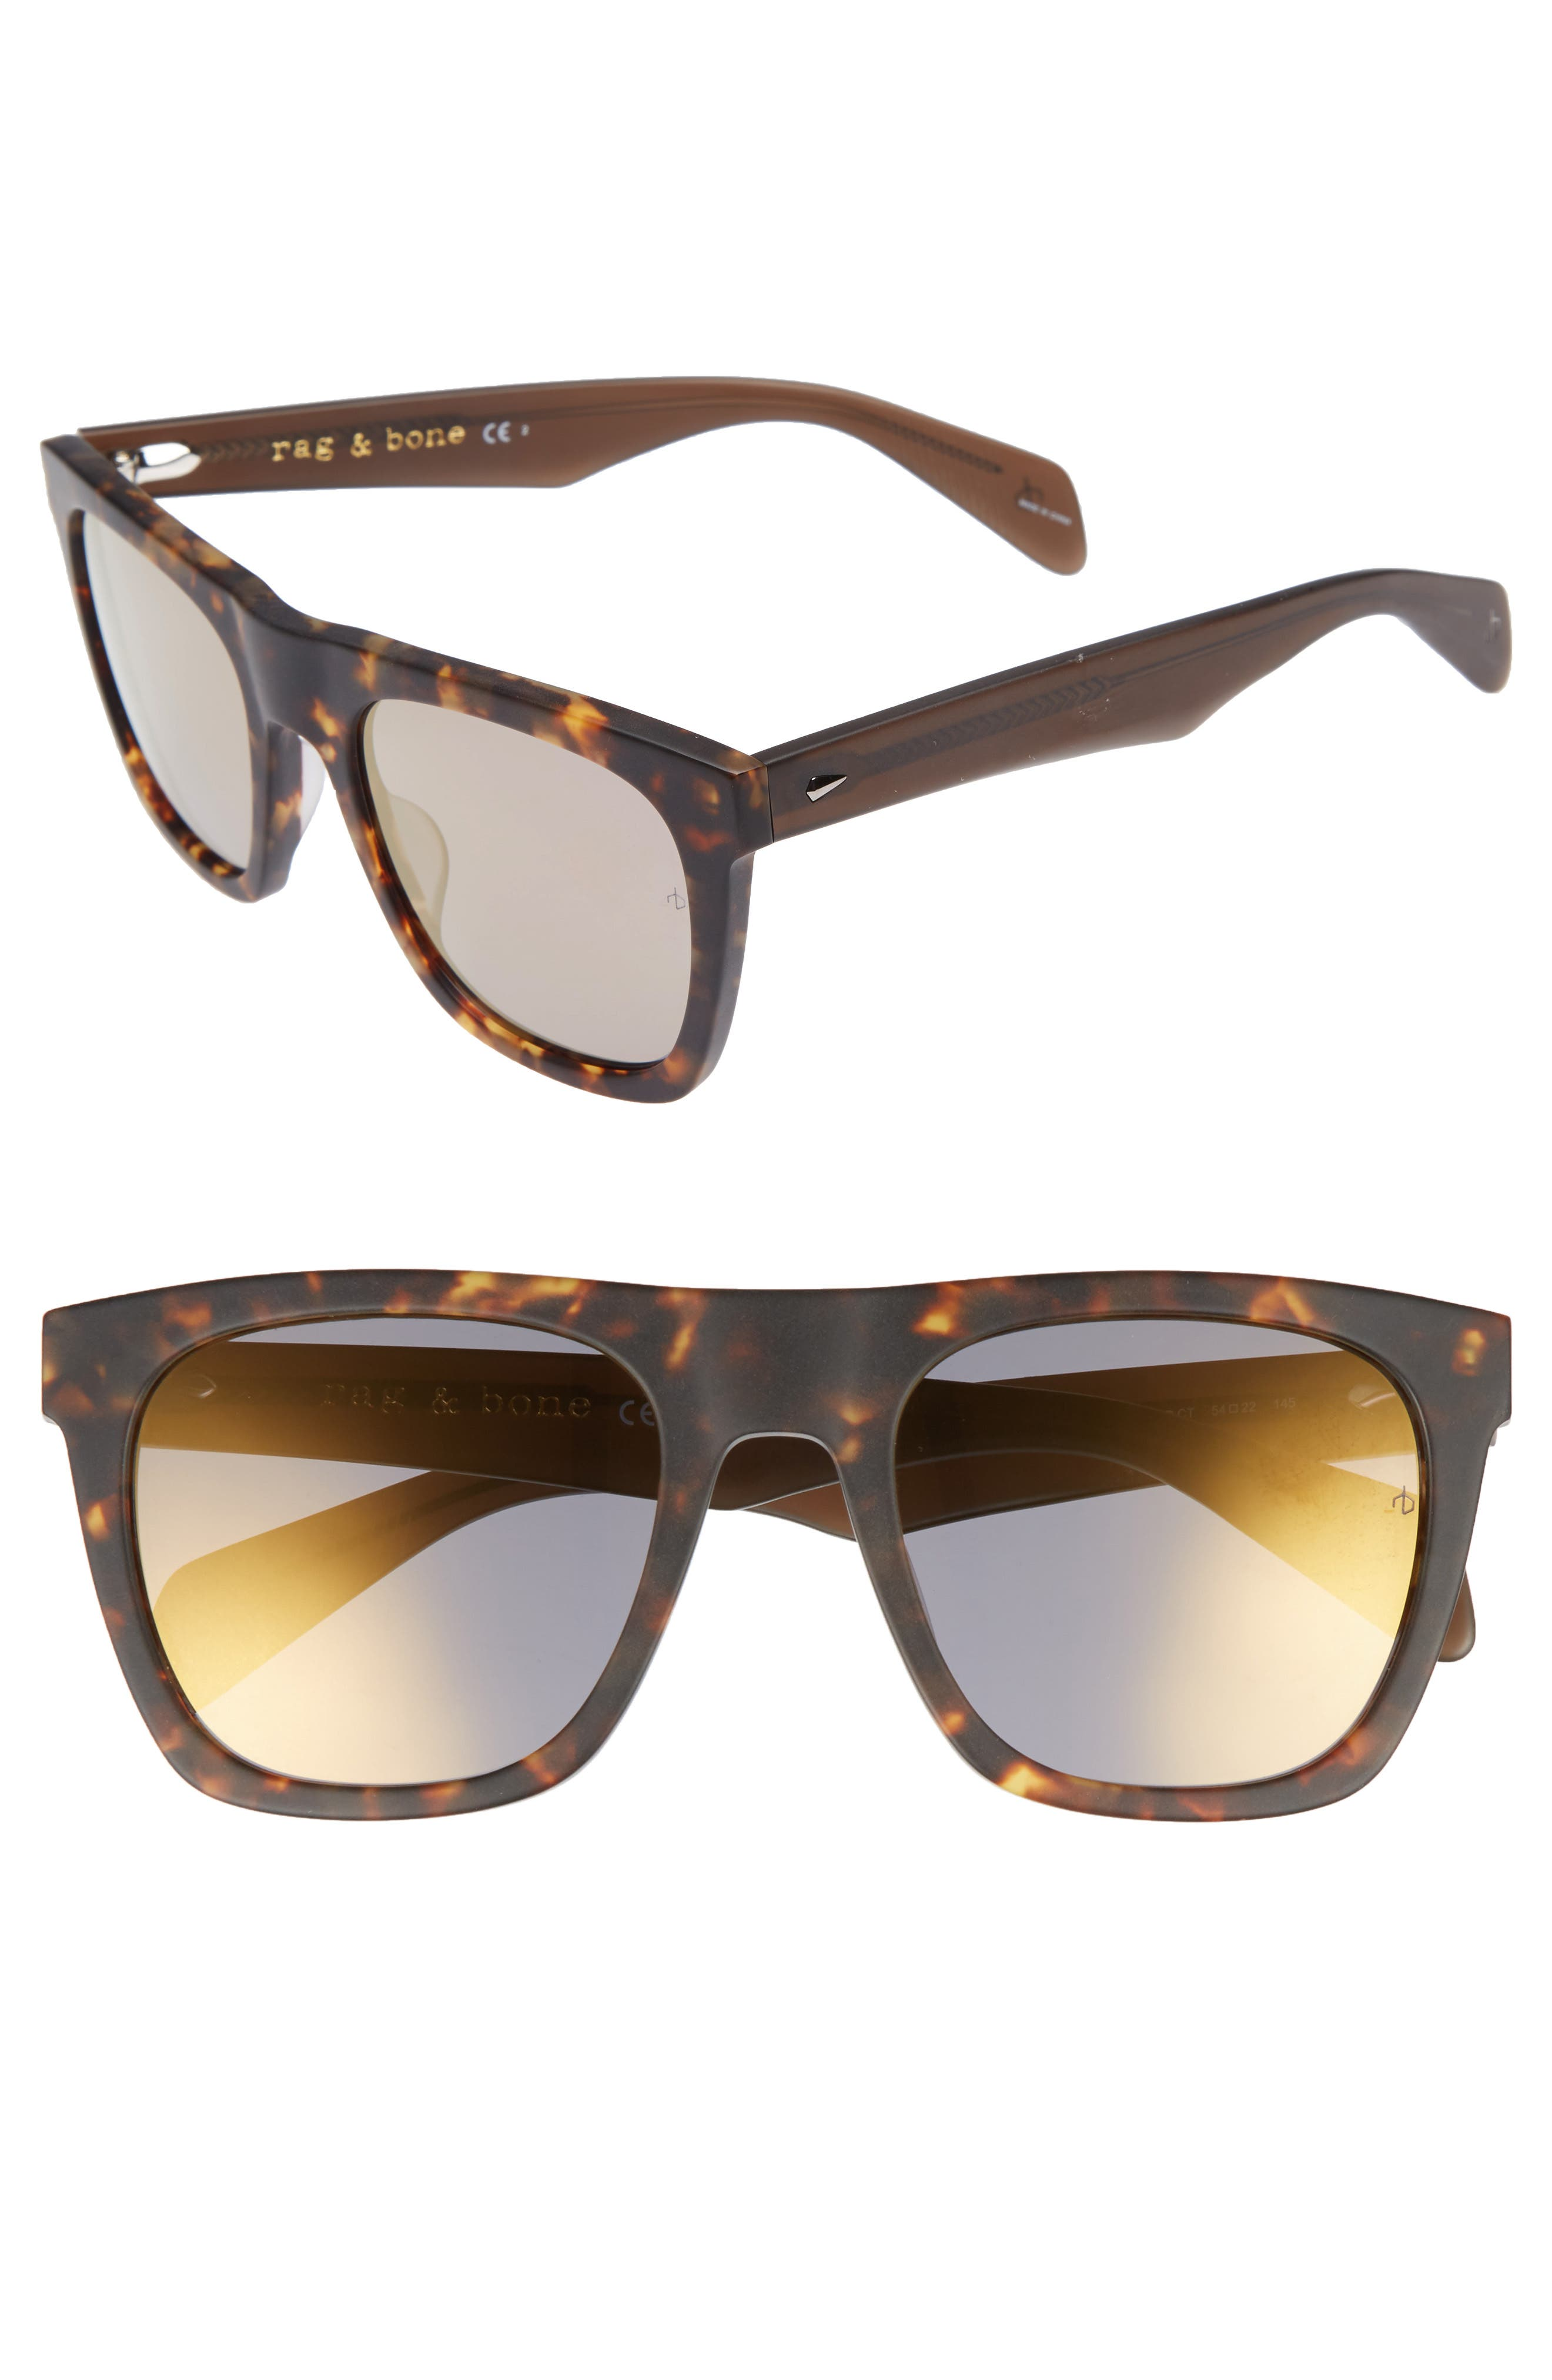 54mm Sunglasses,                             Main thumbnail 1, color,                             210